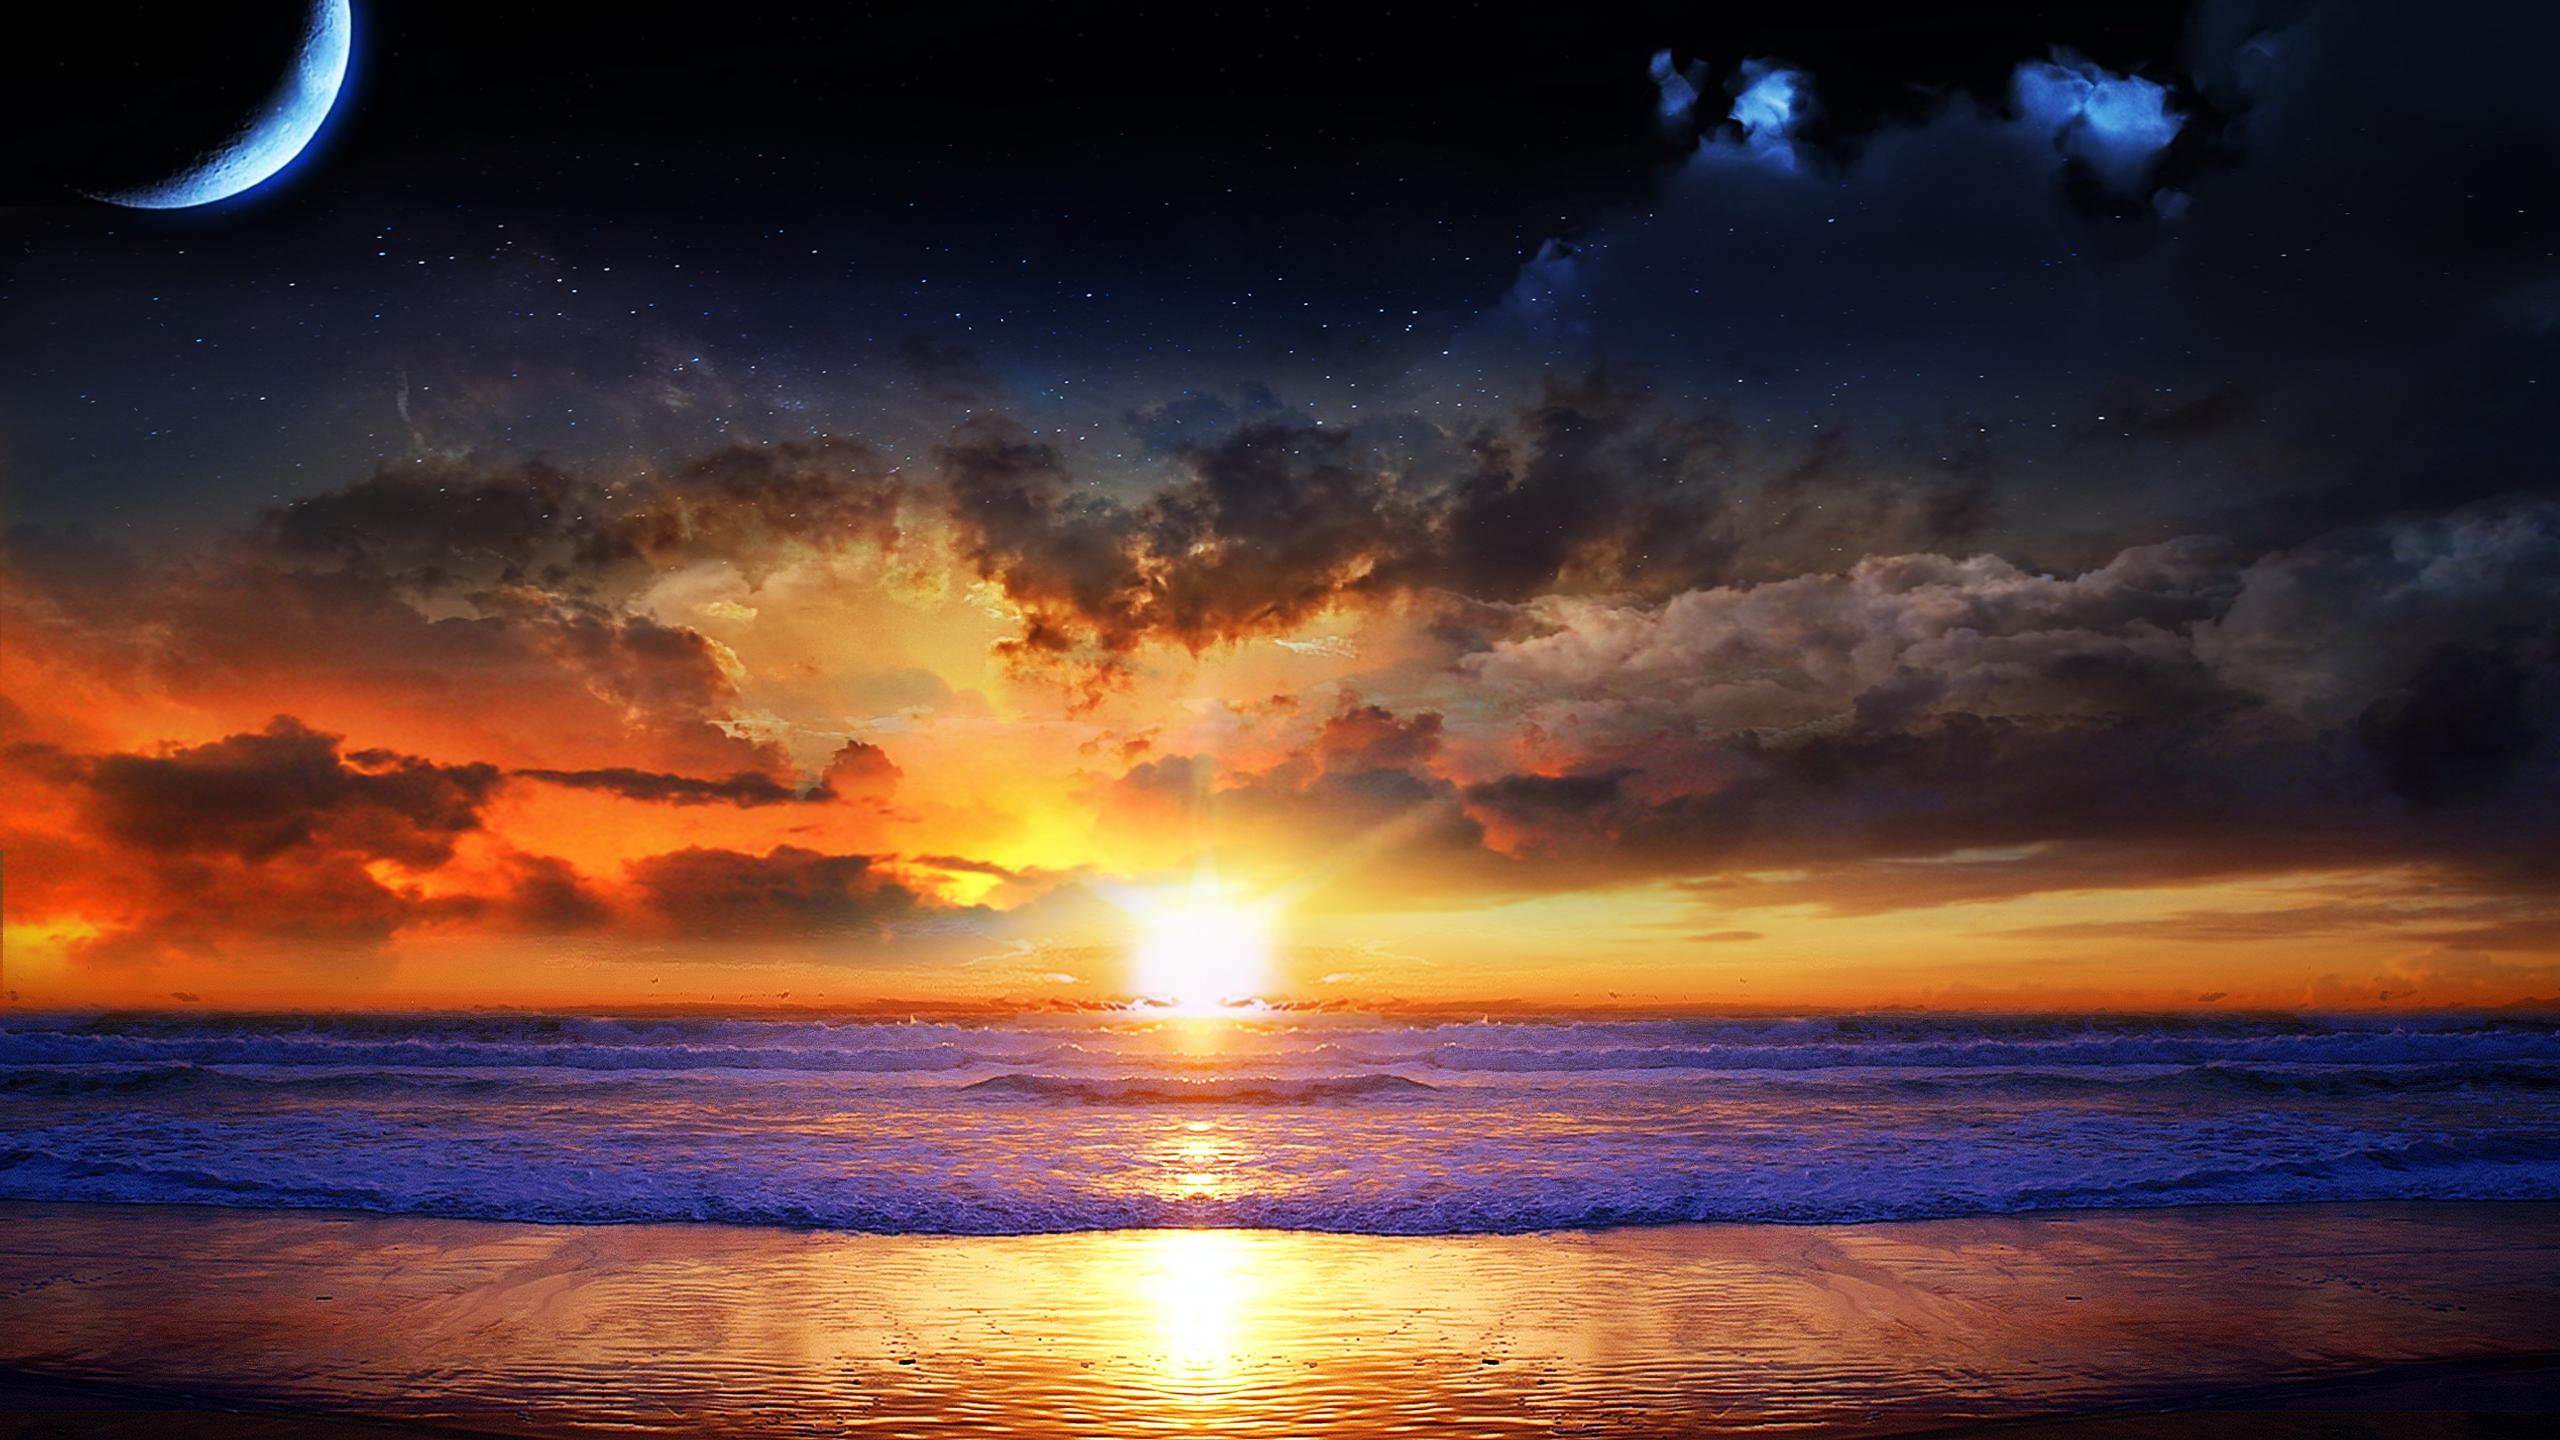 http://americanpsycho.deviantart.com/art/Vulcan-Sunrise-372873798